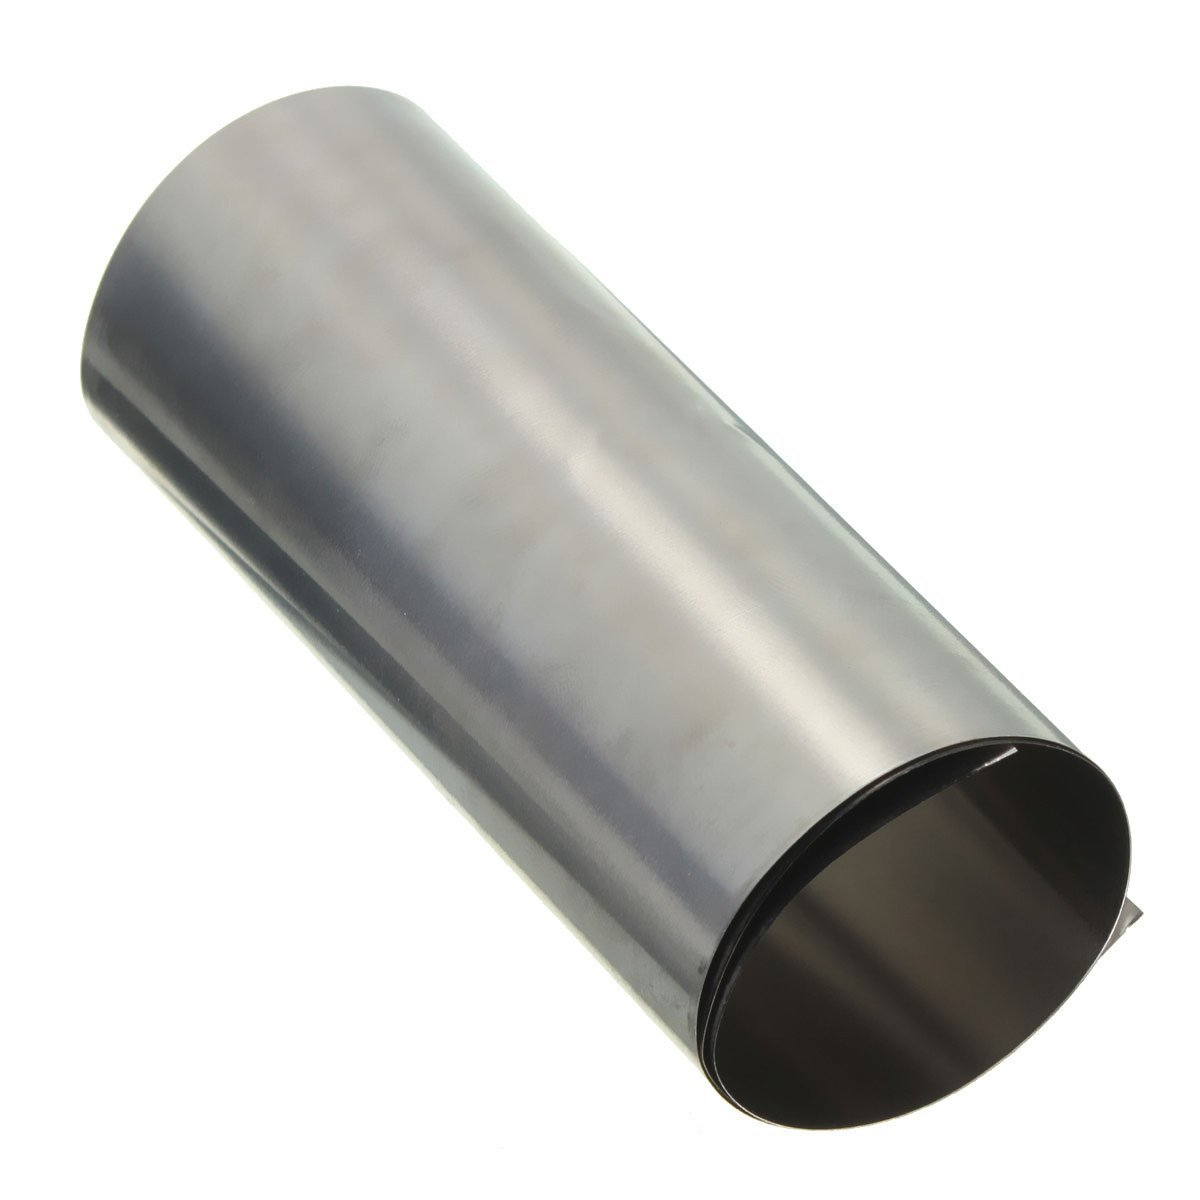 HITSAN Titanium Alloy Plate TC4/GR5 Titanium Plate 0.1100300mm One Piece